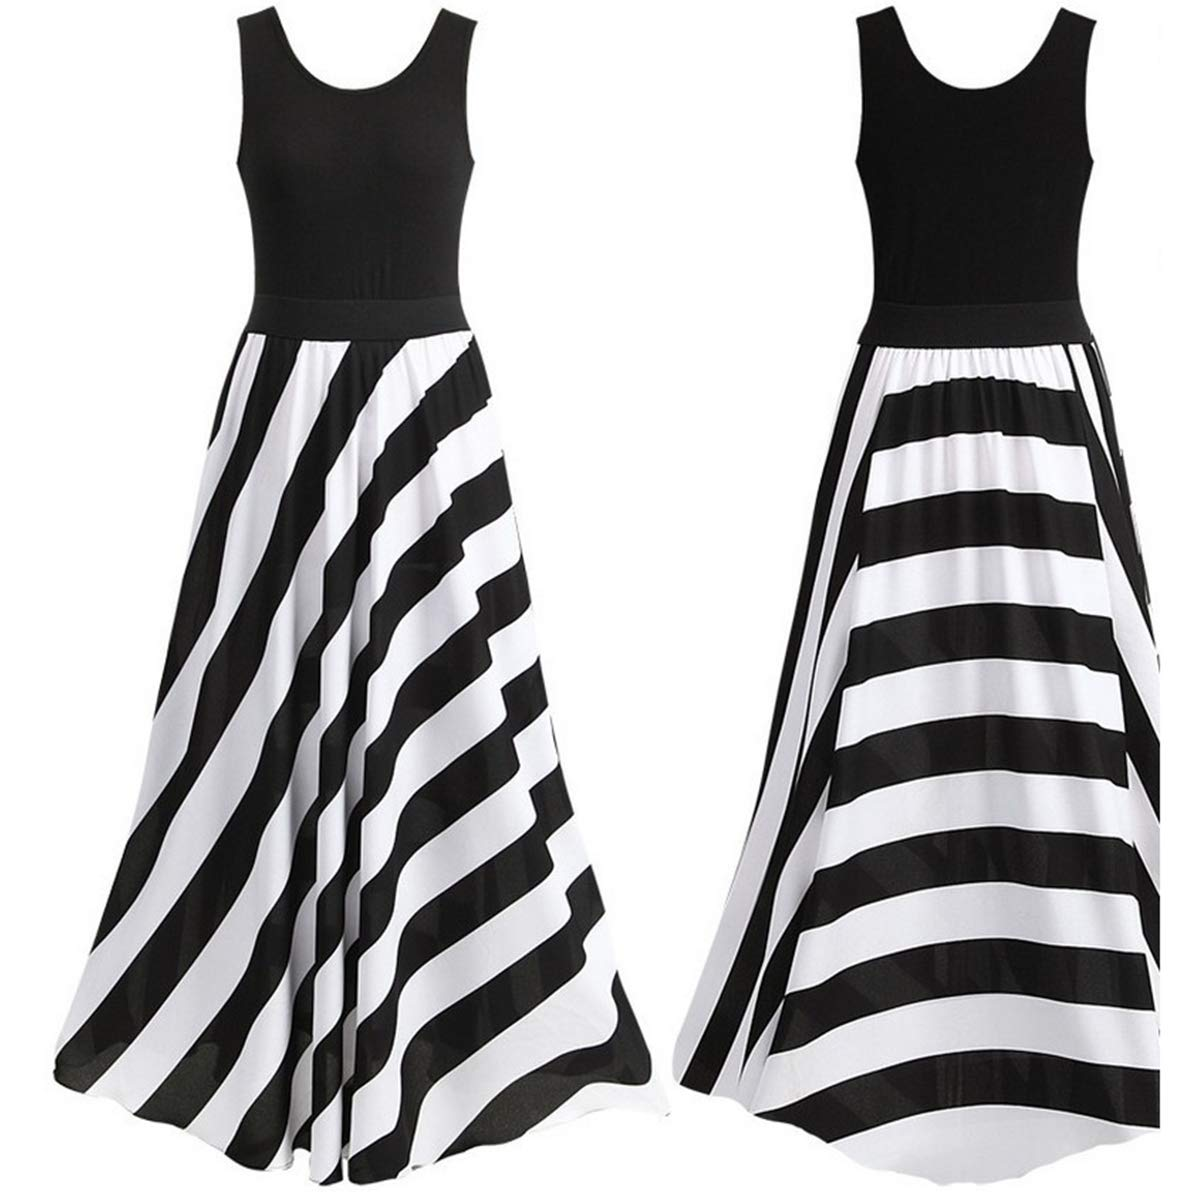 Women Long Maxi Dress Evening Cocktail Career Floral Lace Chiffon Stripe Dress (Black, L)